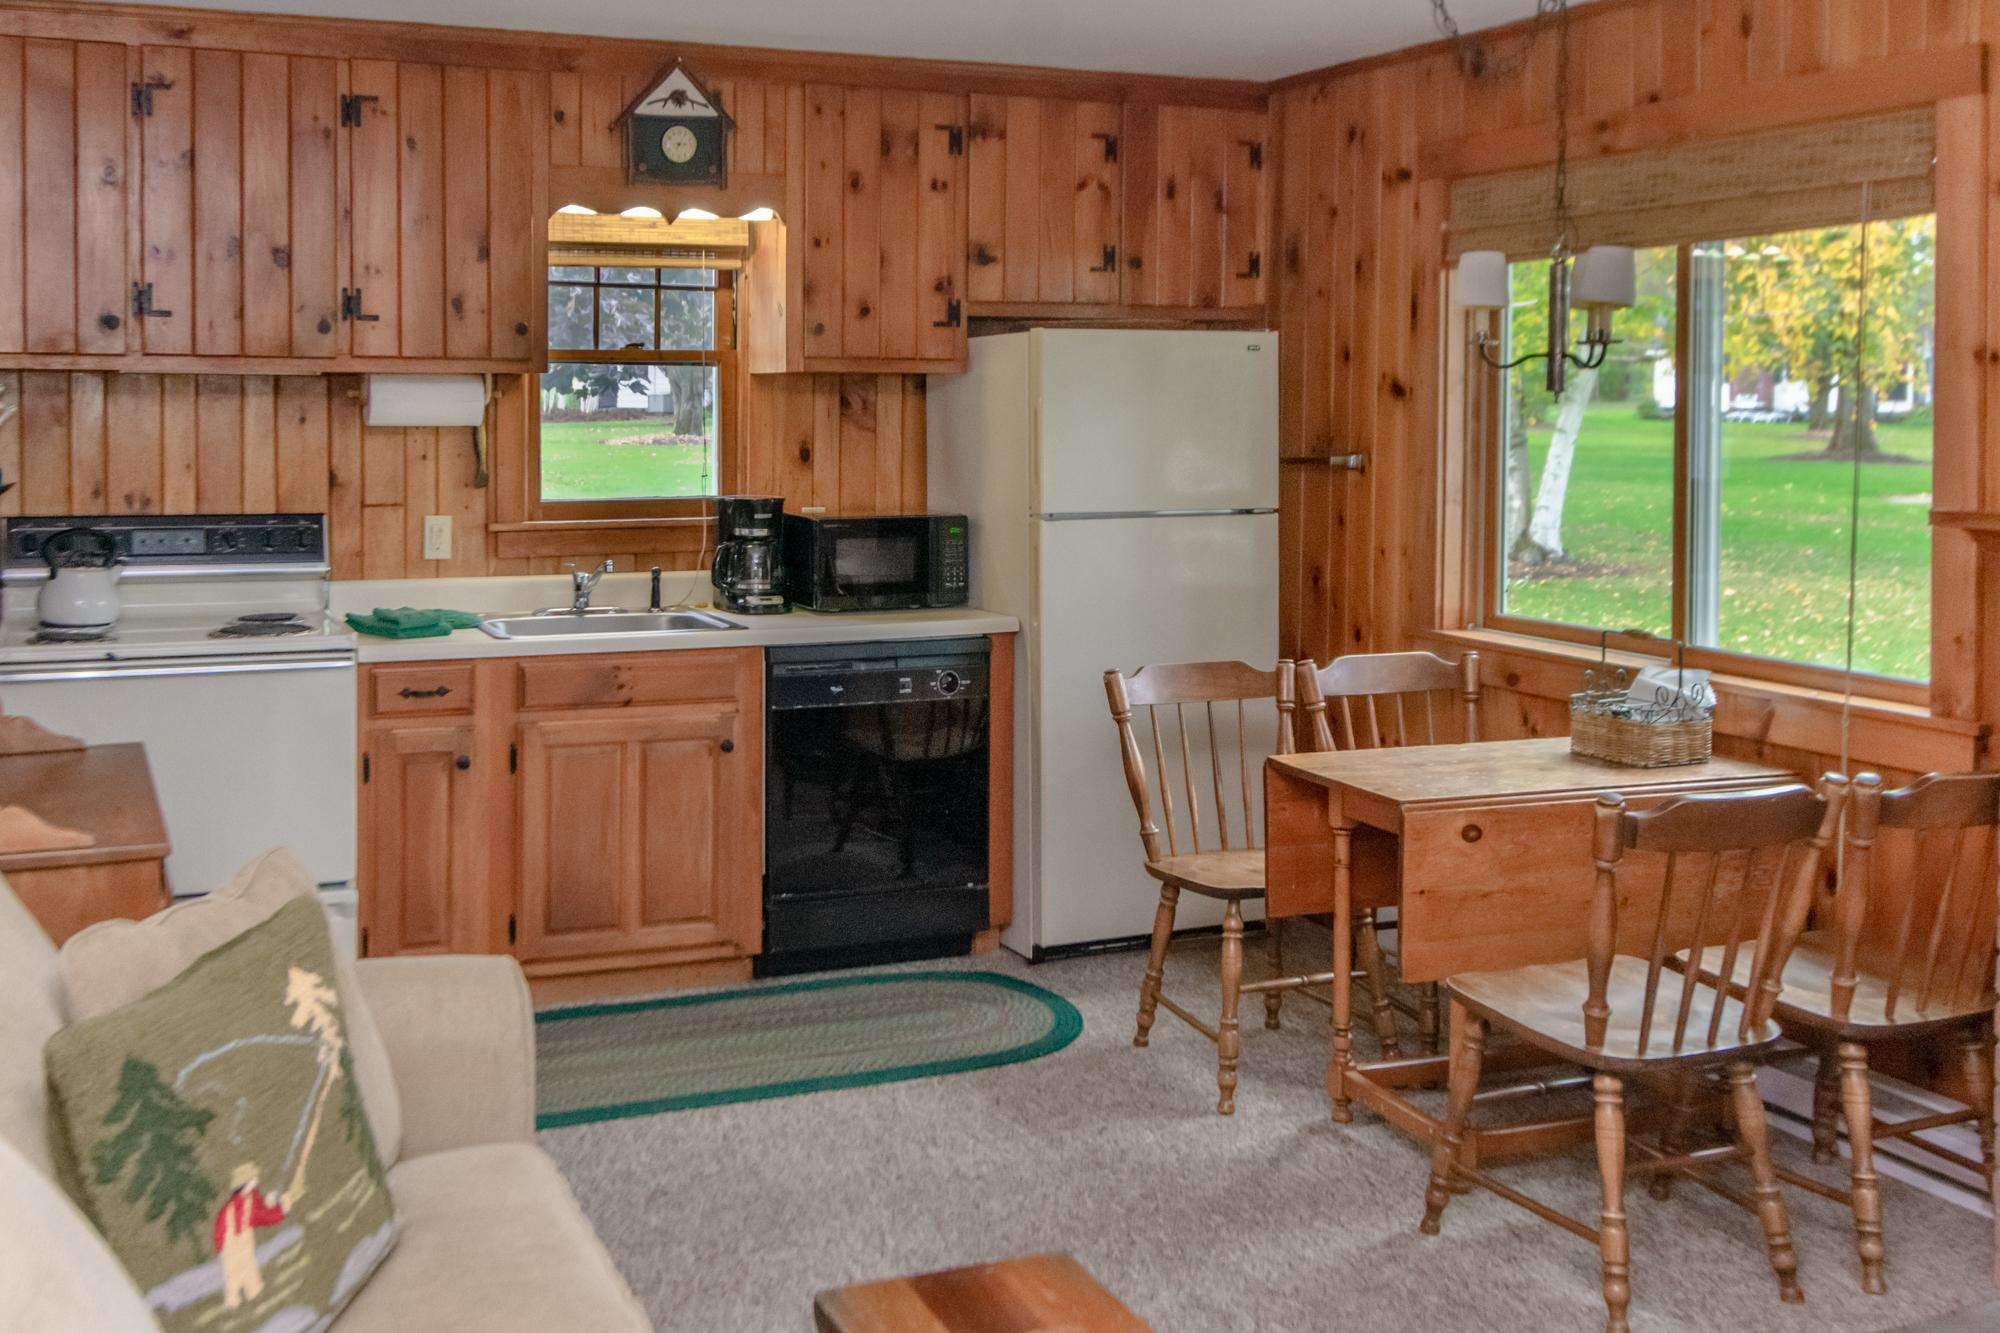 Takundewide Cottage #11 Kitchenwithdishwasher-3